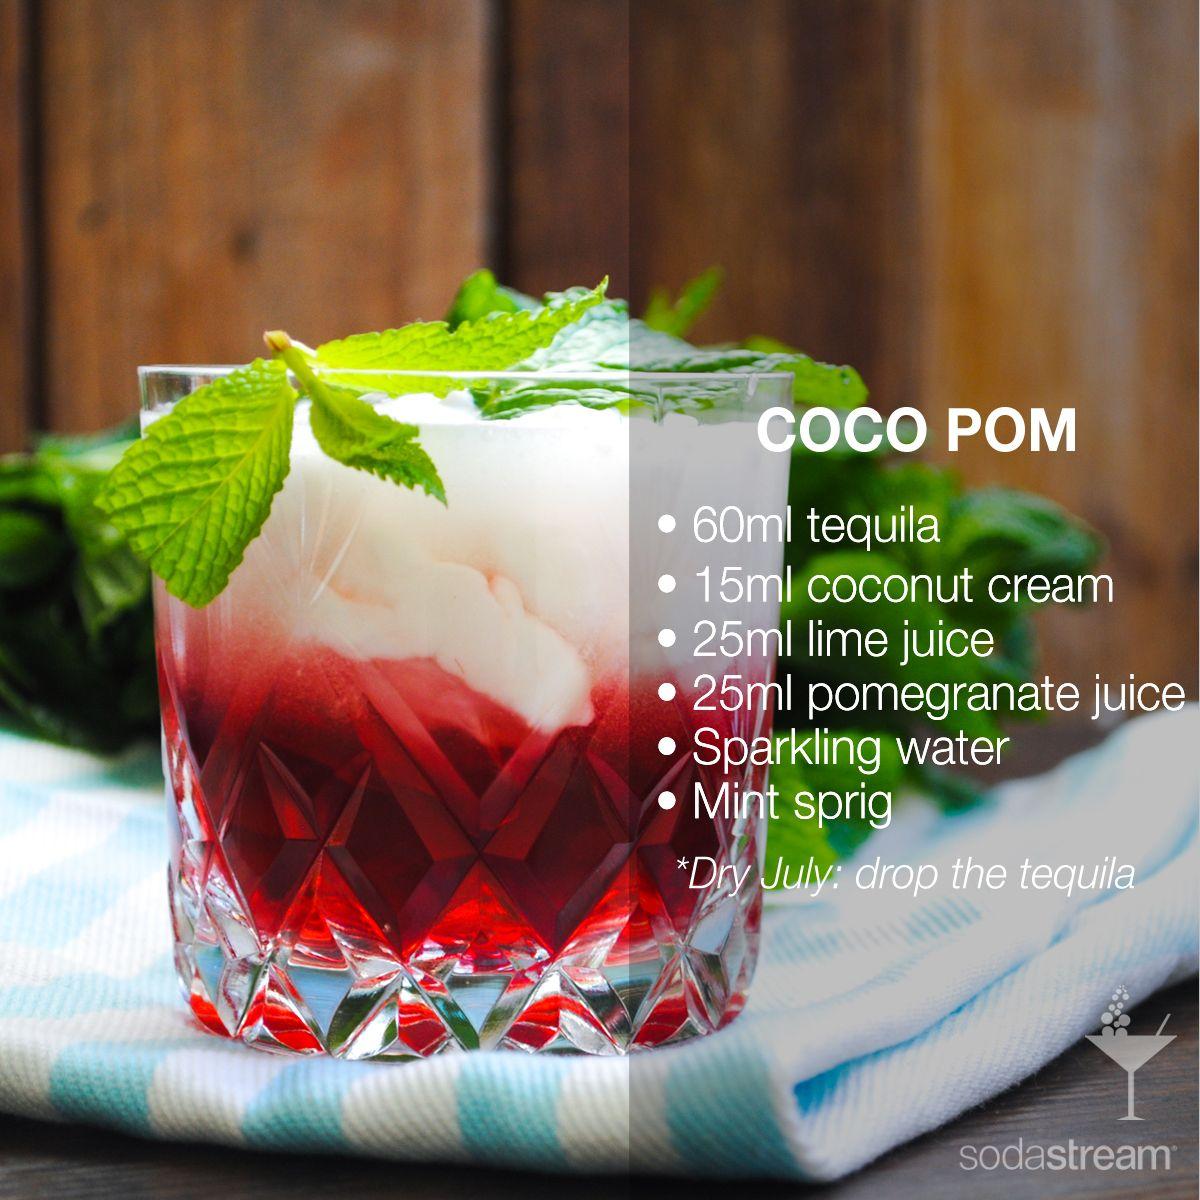 Coco Pom 60ml Tequila 15ml Coconut Cream 25ml Lime Juice 25ml Pomegranate Juice Sparkling Water Mi Coconut Cream Infused Water Recipes Pomegranate Juice